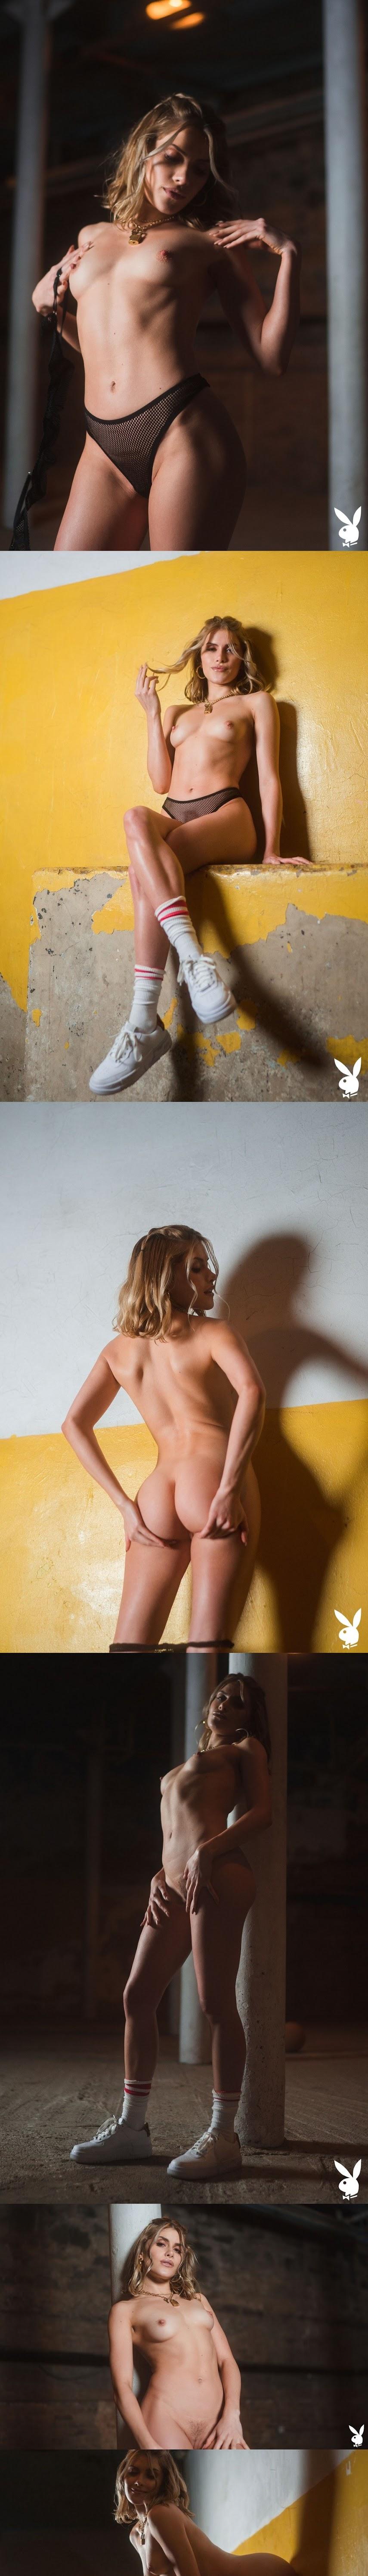 1634310364_amelia00_0027 1-[Playboy Plus] Amelia in Midnight Game playboy-plus 10190